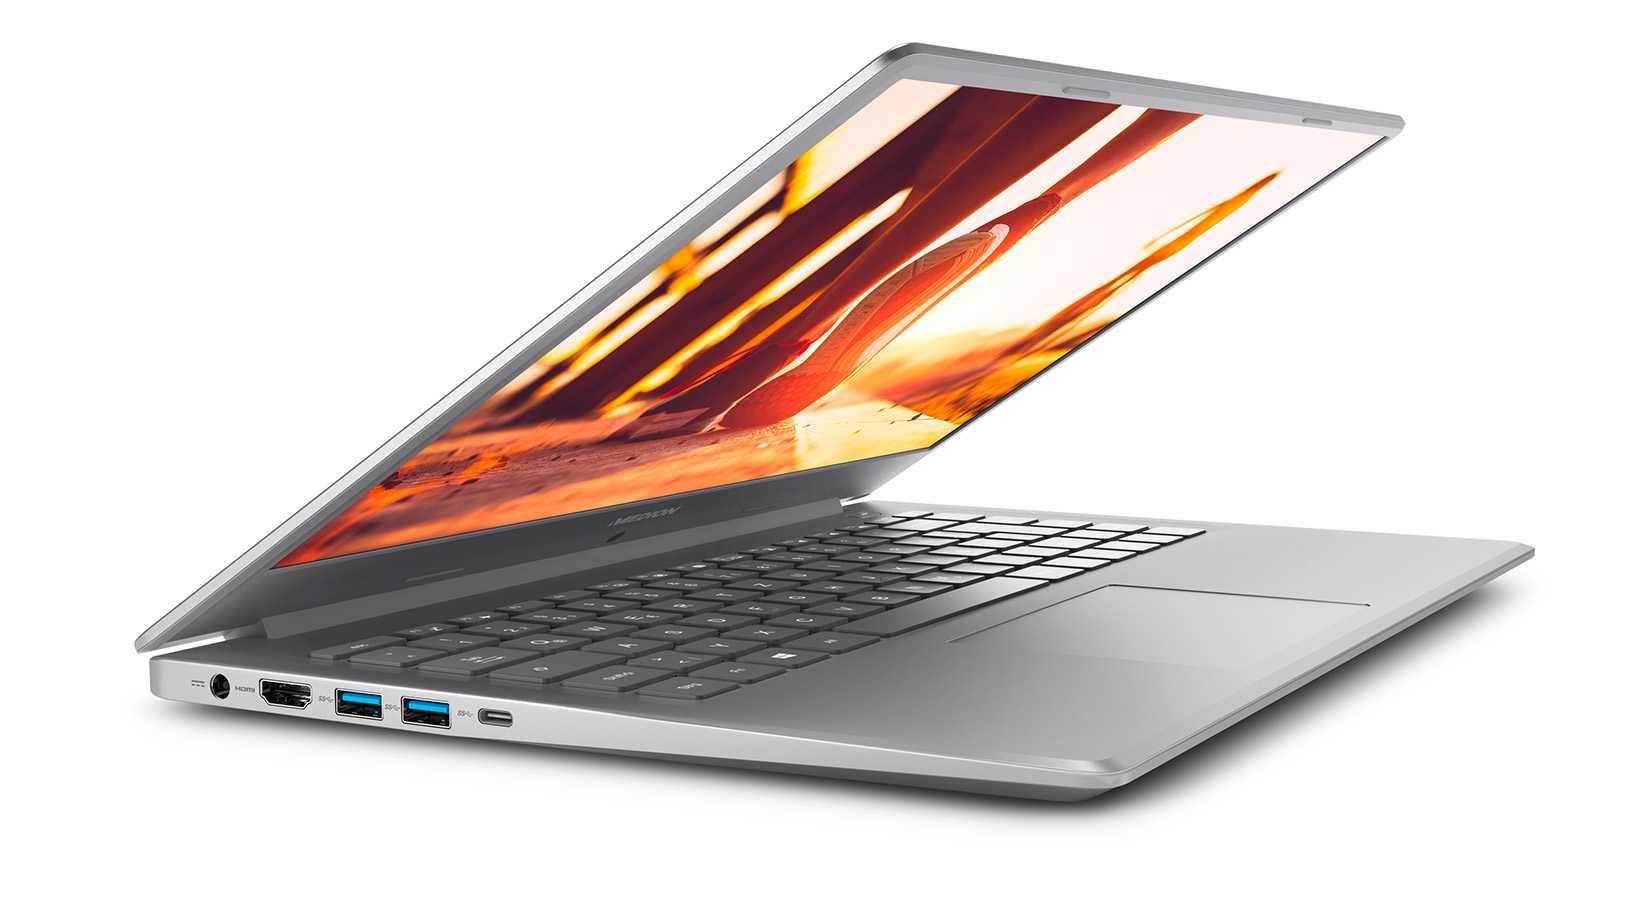 Medion Akoya P6645: Aldi bringt 15,6-Zoll-Notebook mit 512-GByte-SSD